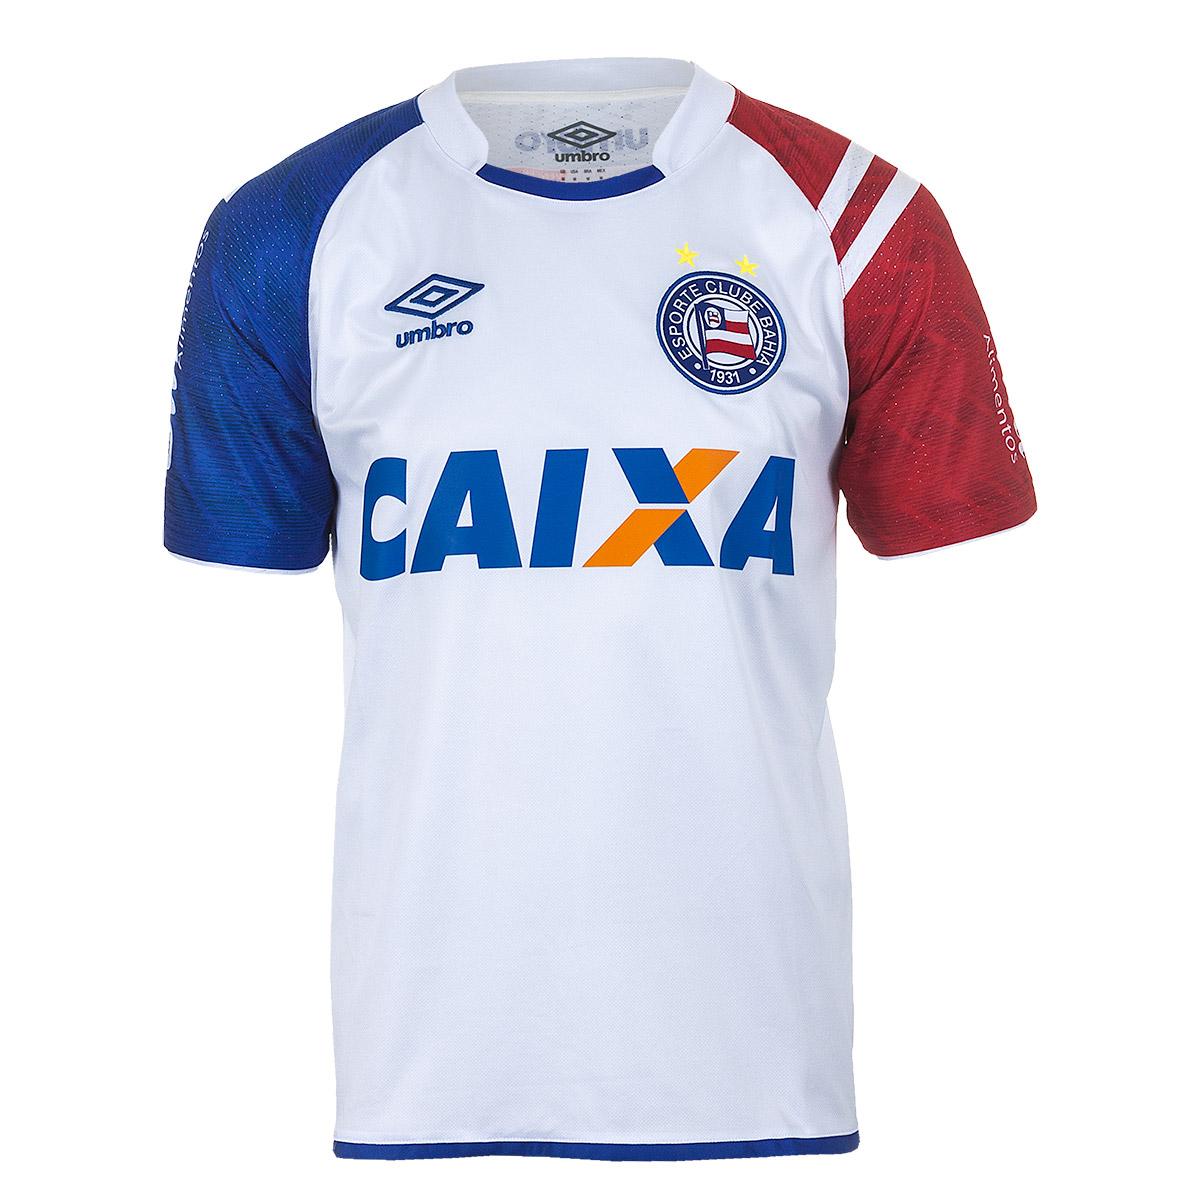 Camisa Masc. Umbro Bahia Of 1 2017 Futebol - Branco/Azul